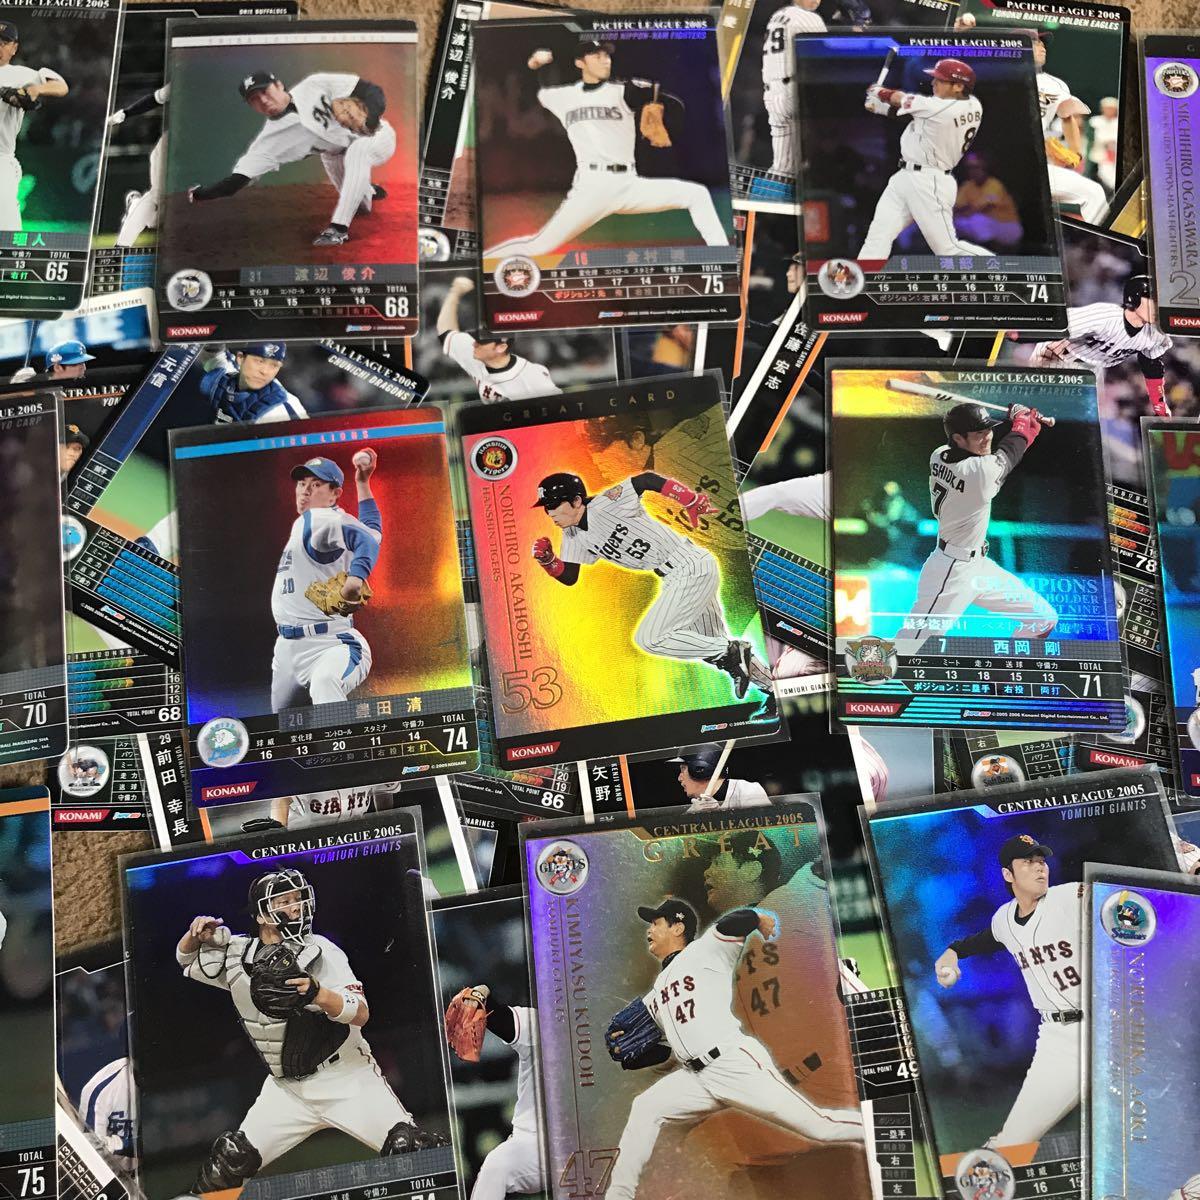 KONAMI ベースボールヒーローズ カード カードゲーム コレクション 1円スタート 最落_画像2